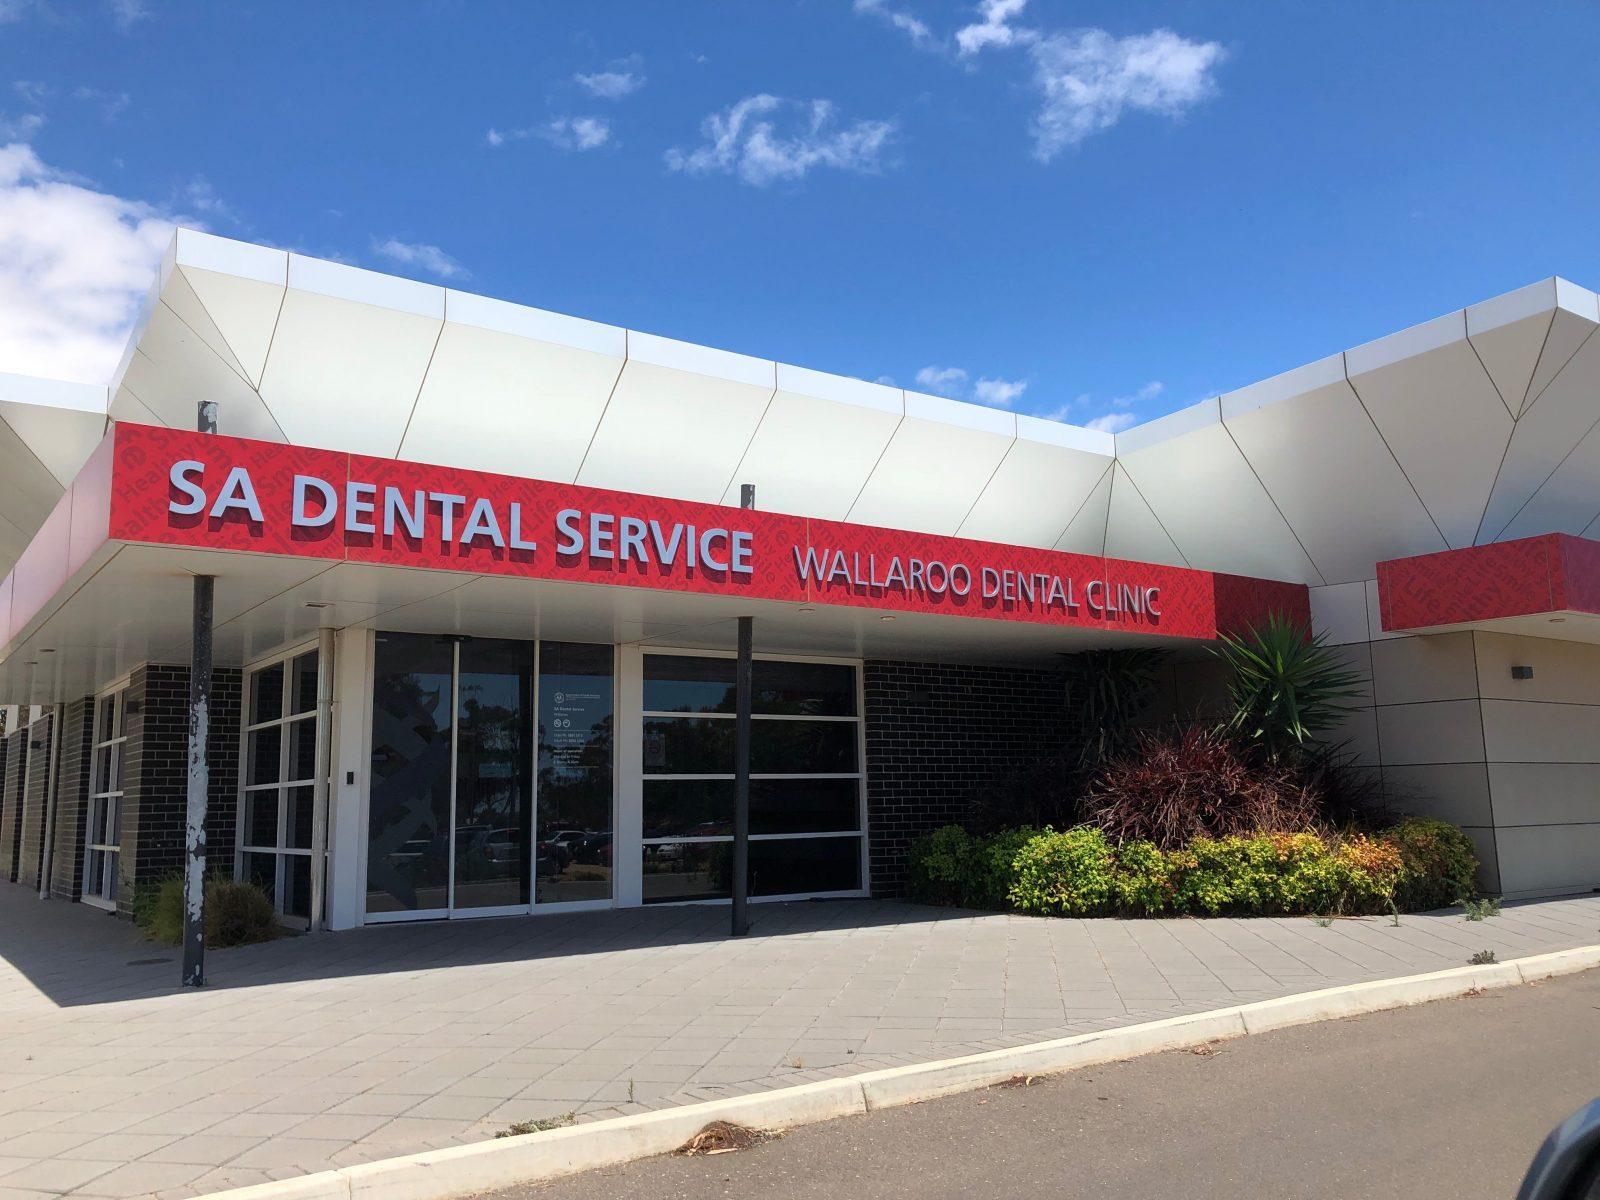 Wallaroo Dental Clinic